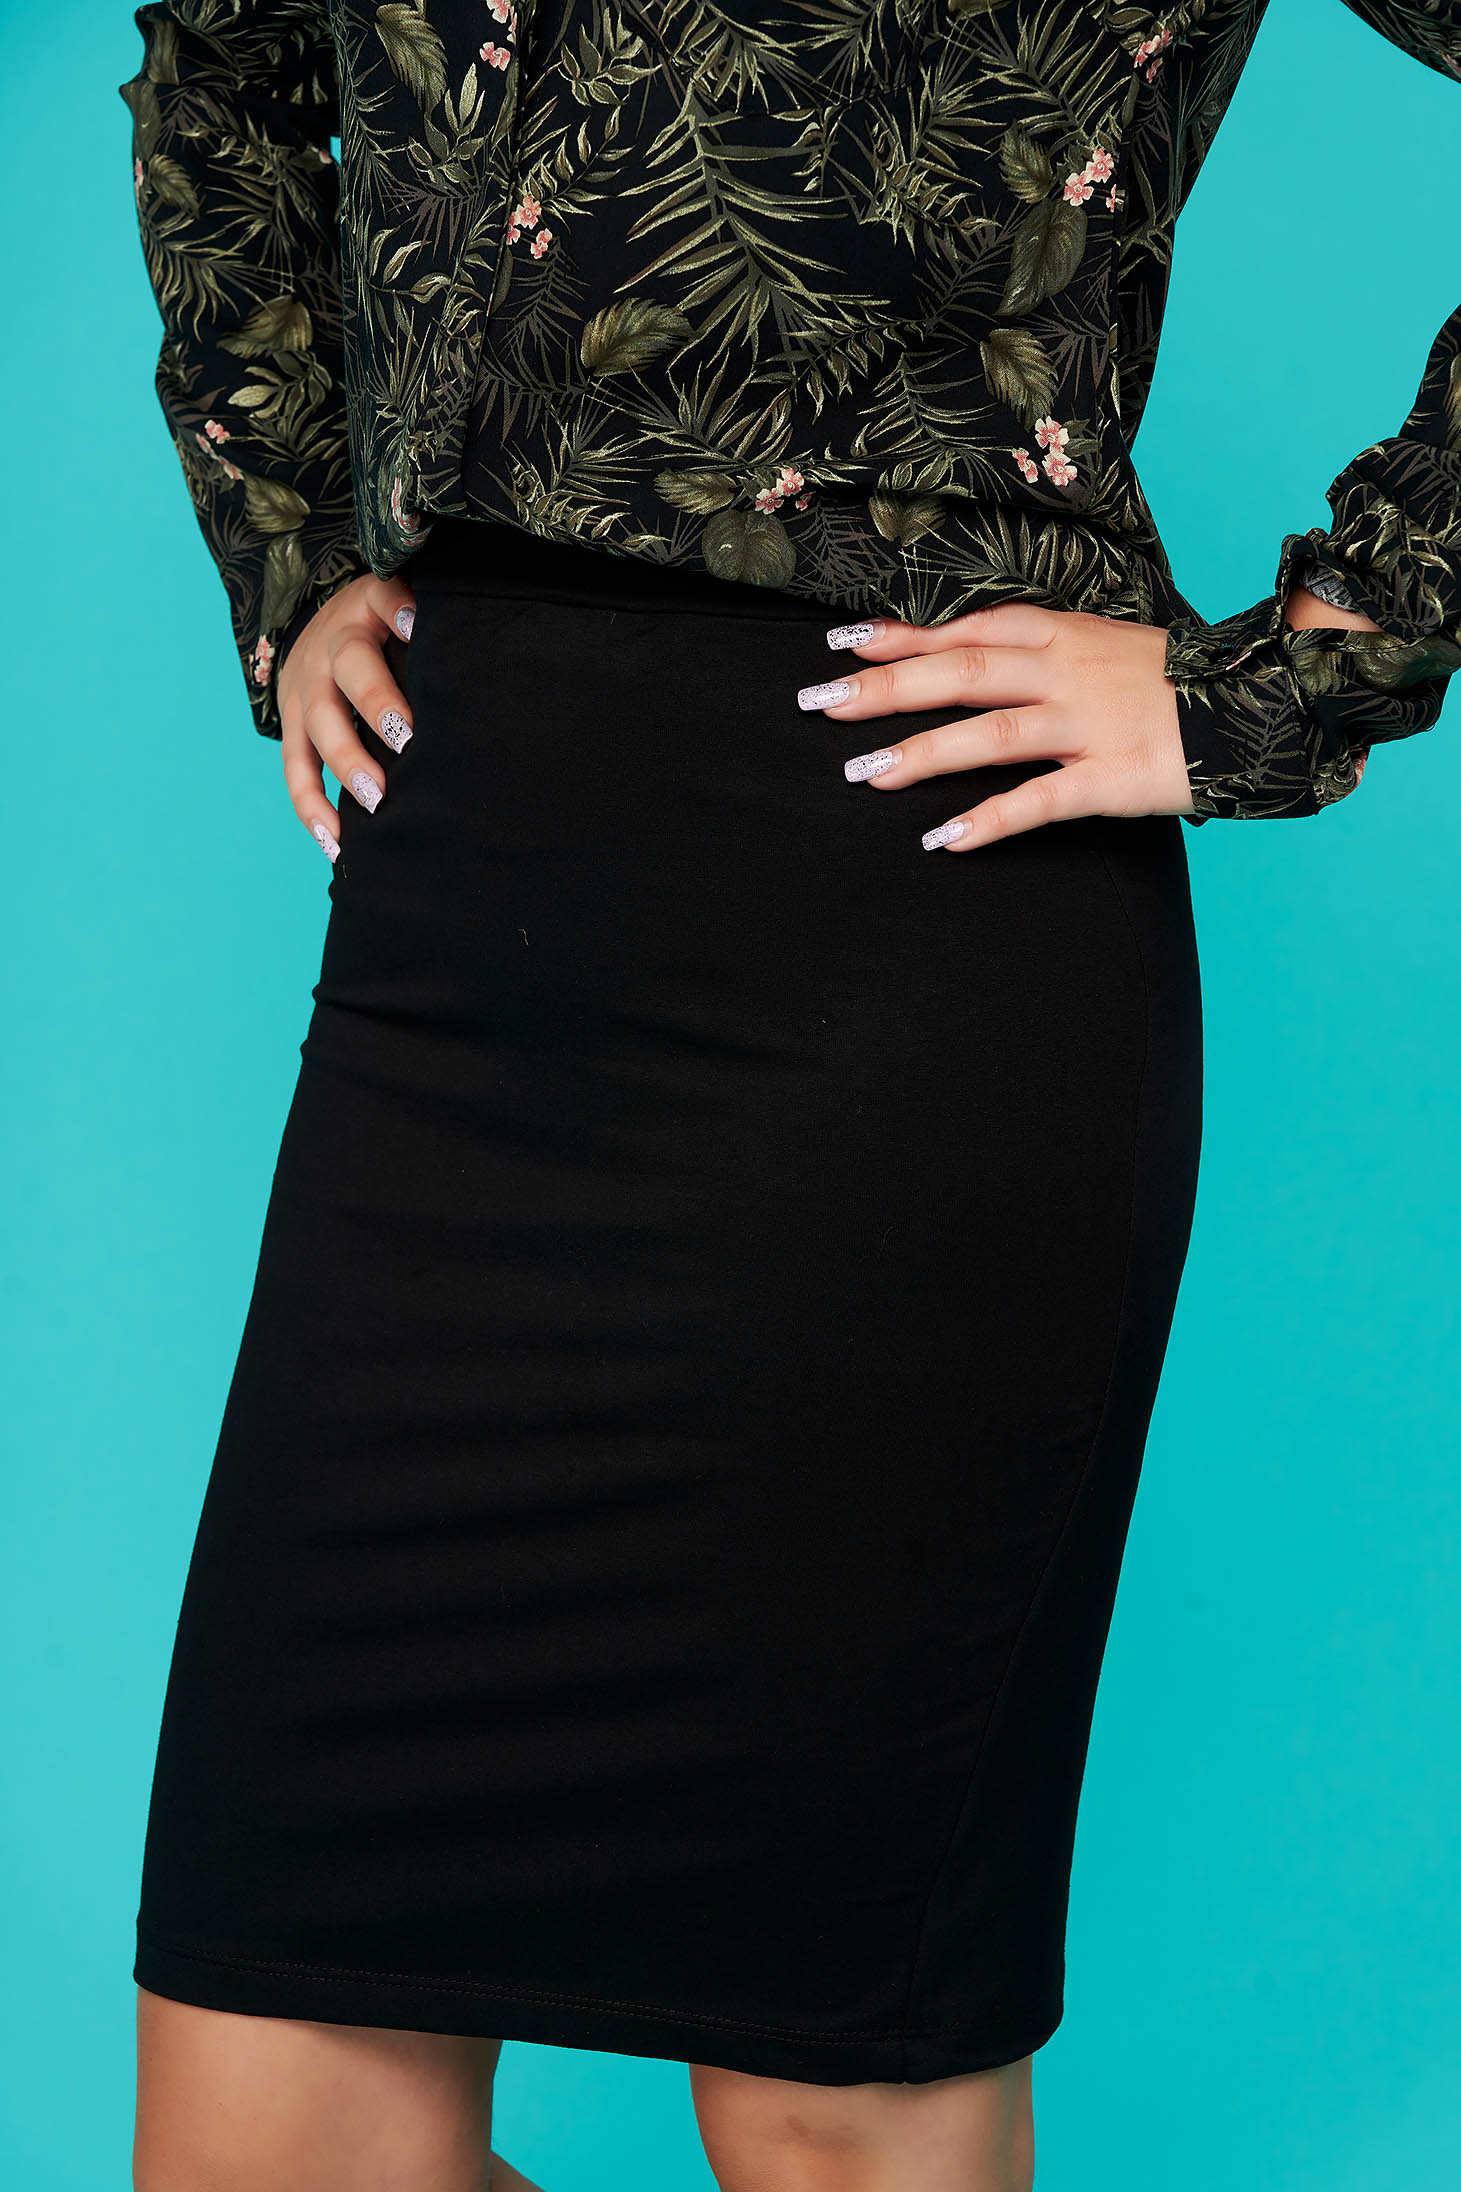 Black skirt short cut pencil cloth thin fabric back slit casual